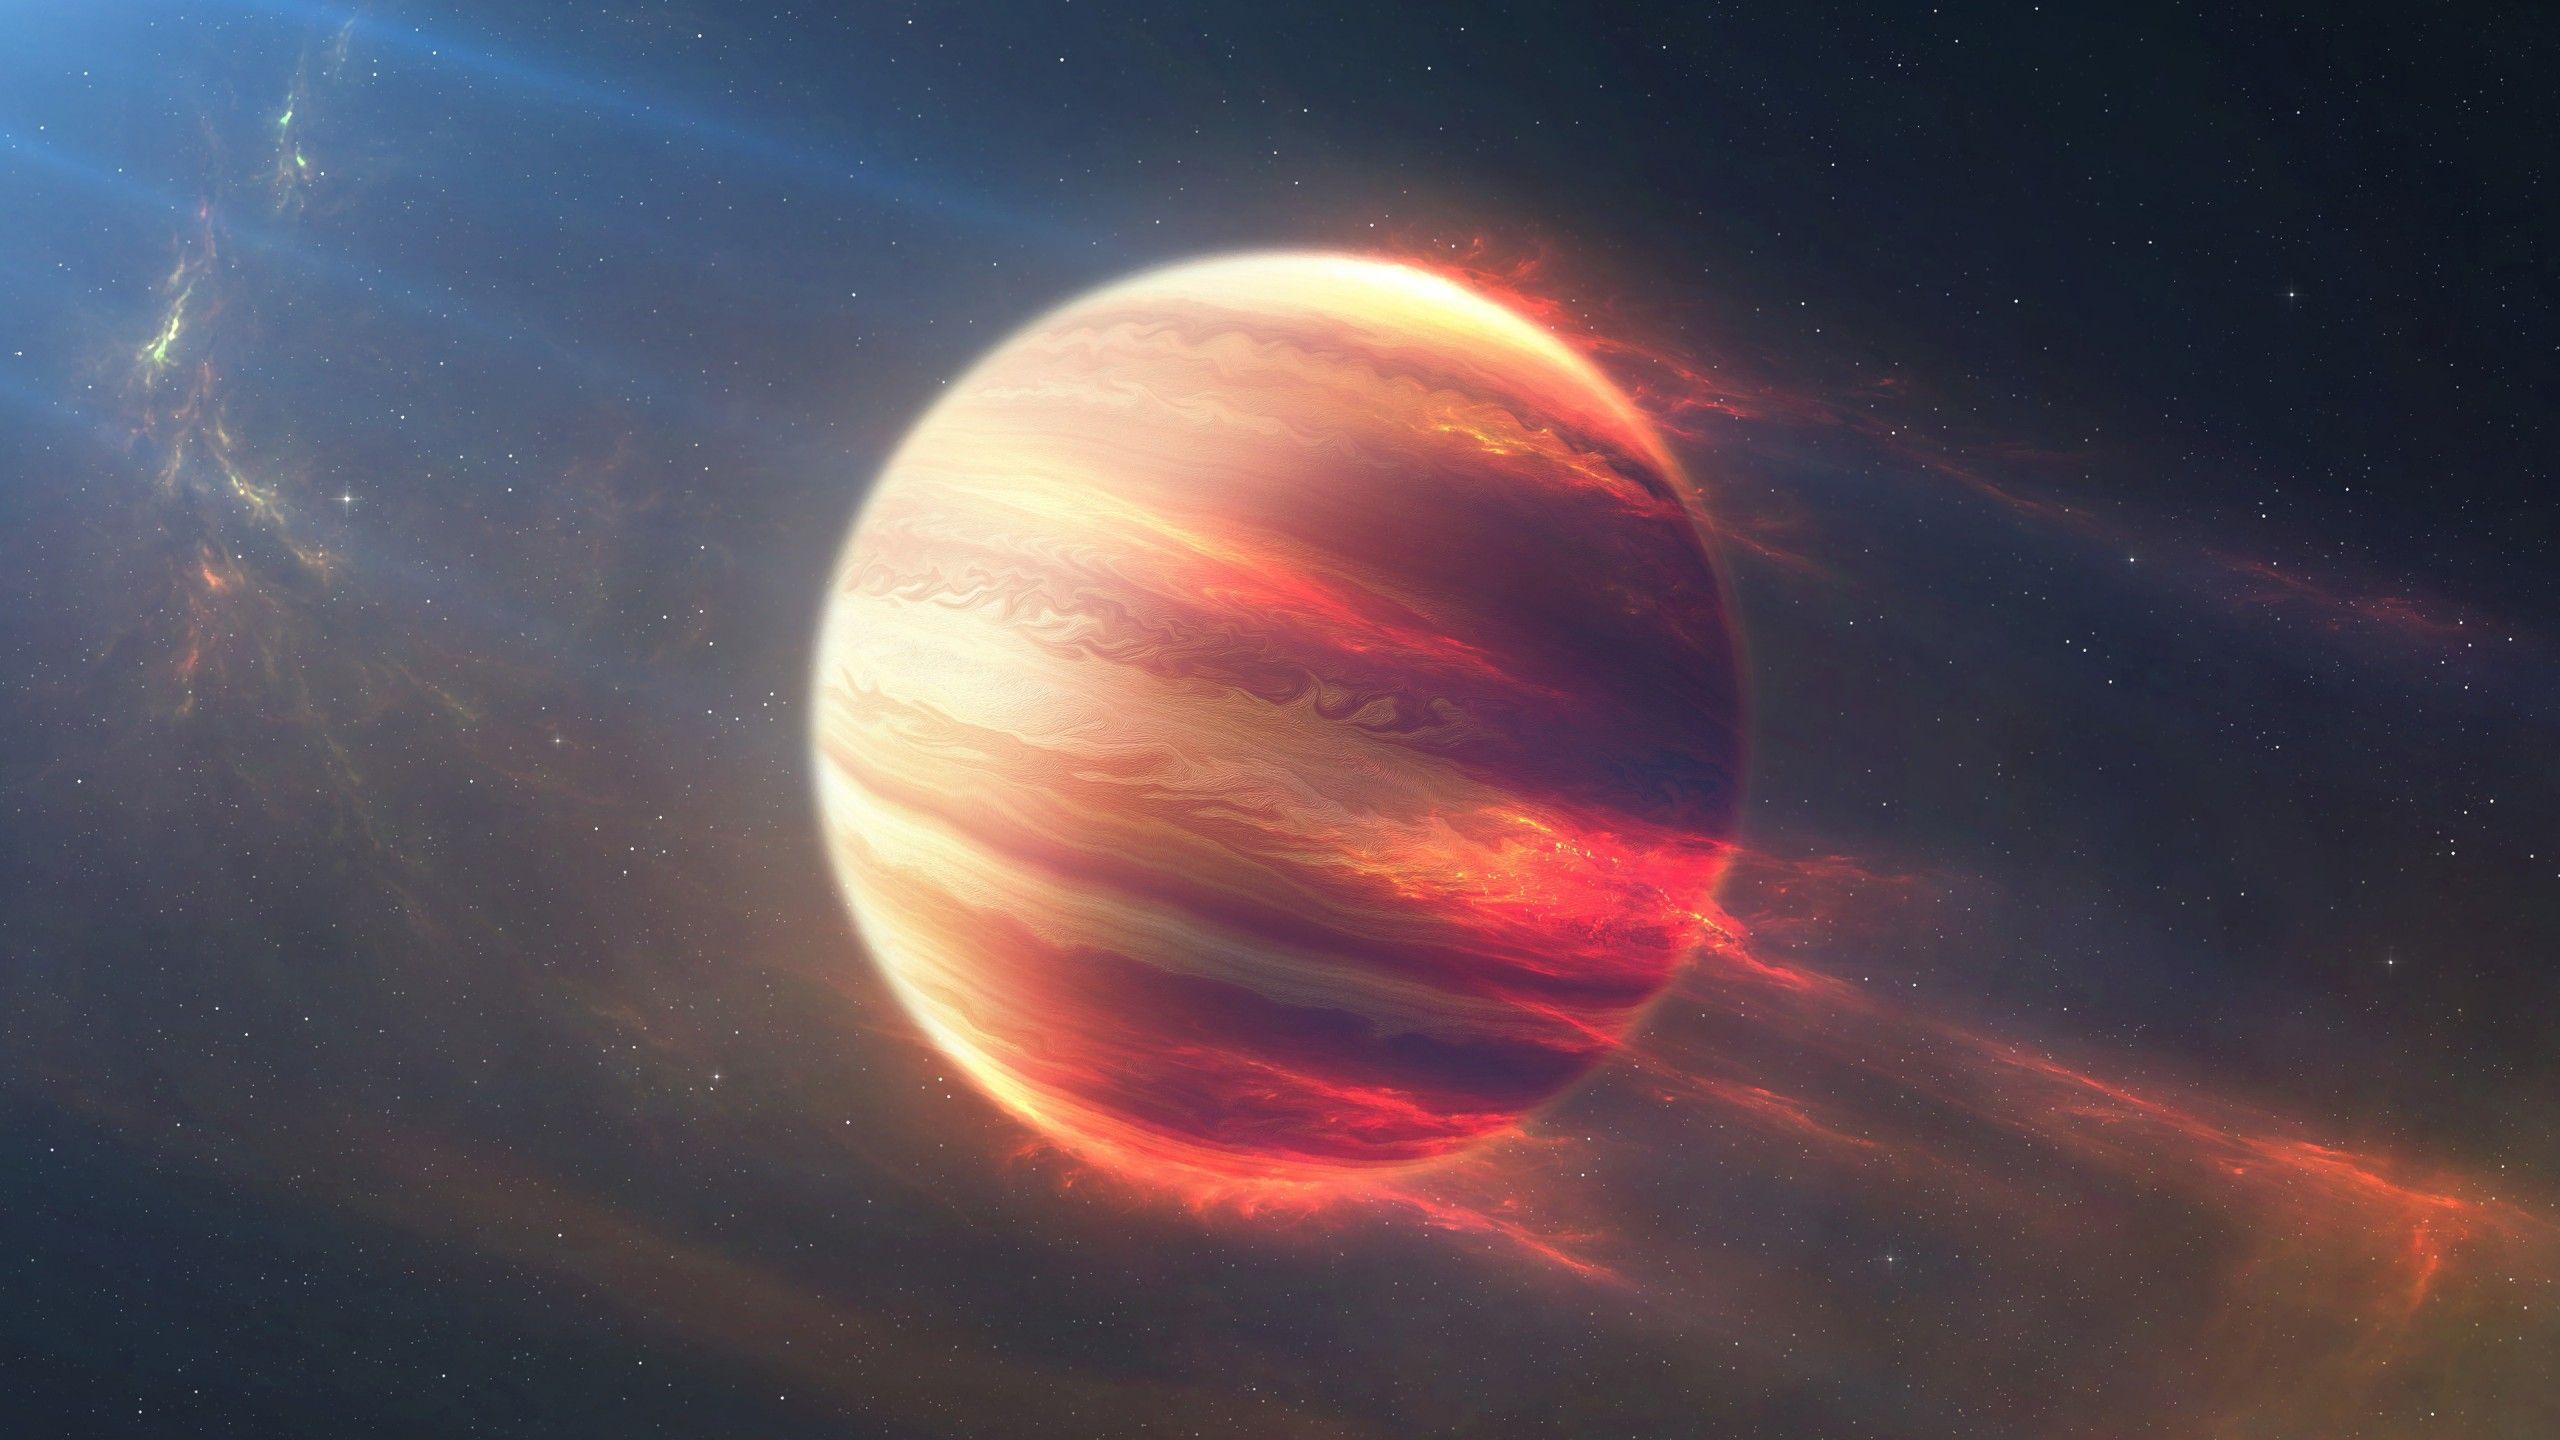 Space Fire HD Wallpaper [2560x1440] via Classy Bro